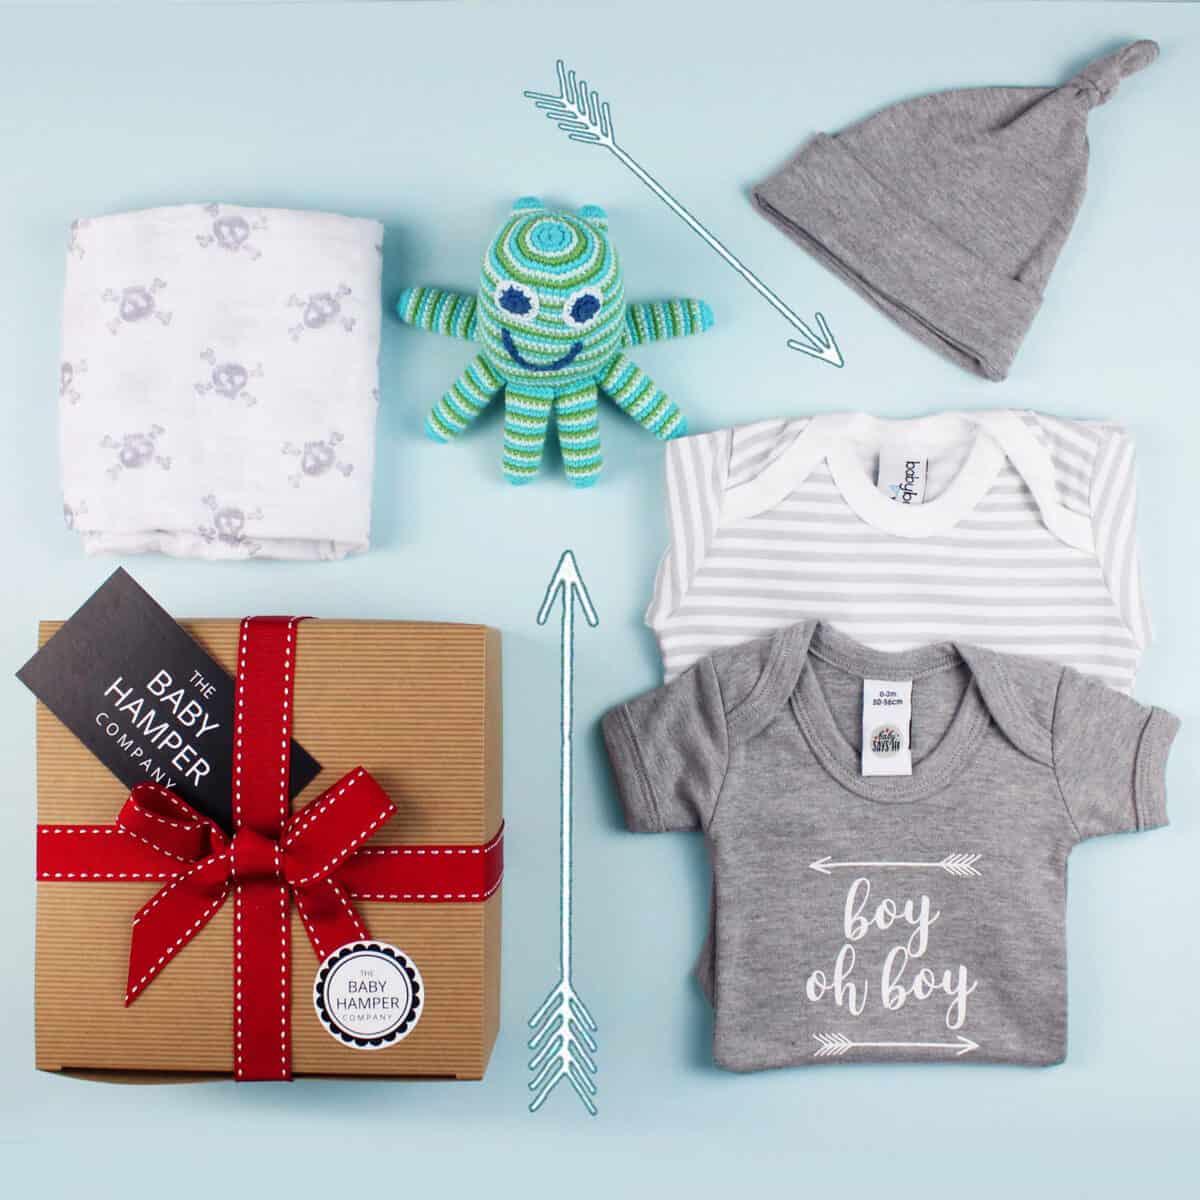 Baby Hamper Company Giveaway! | AD